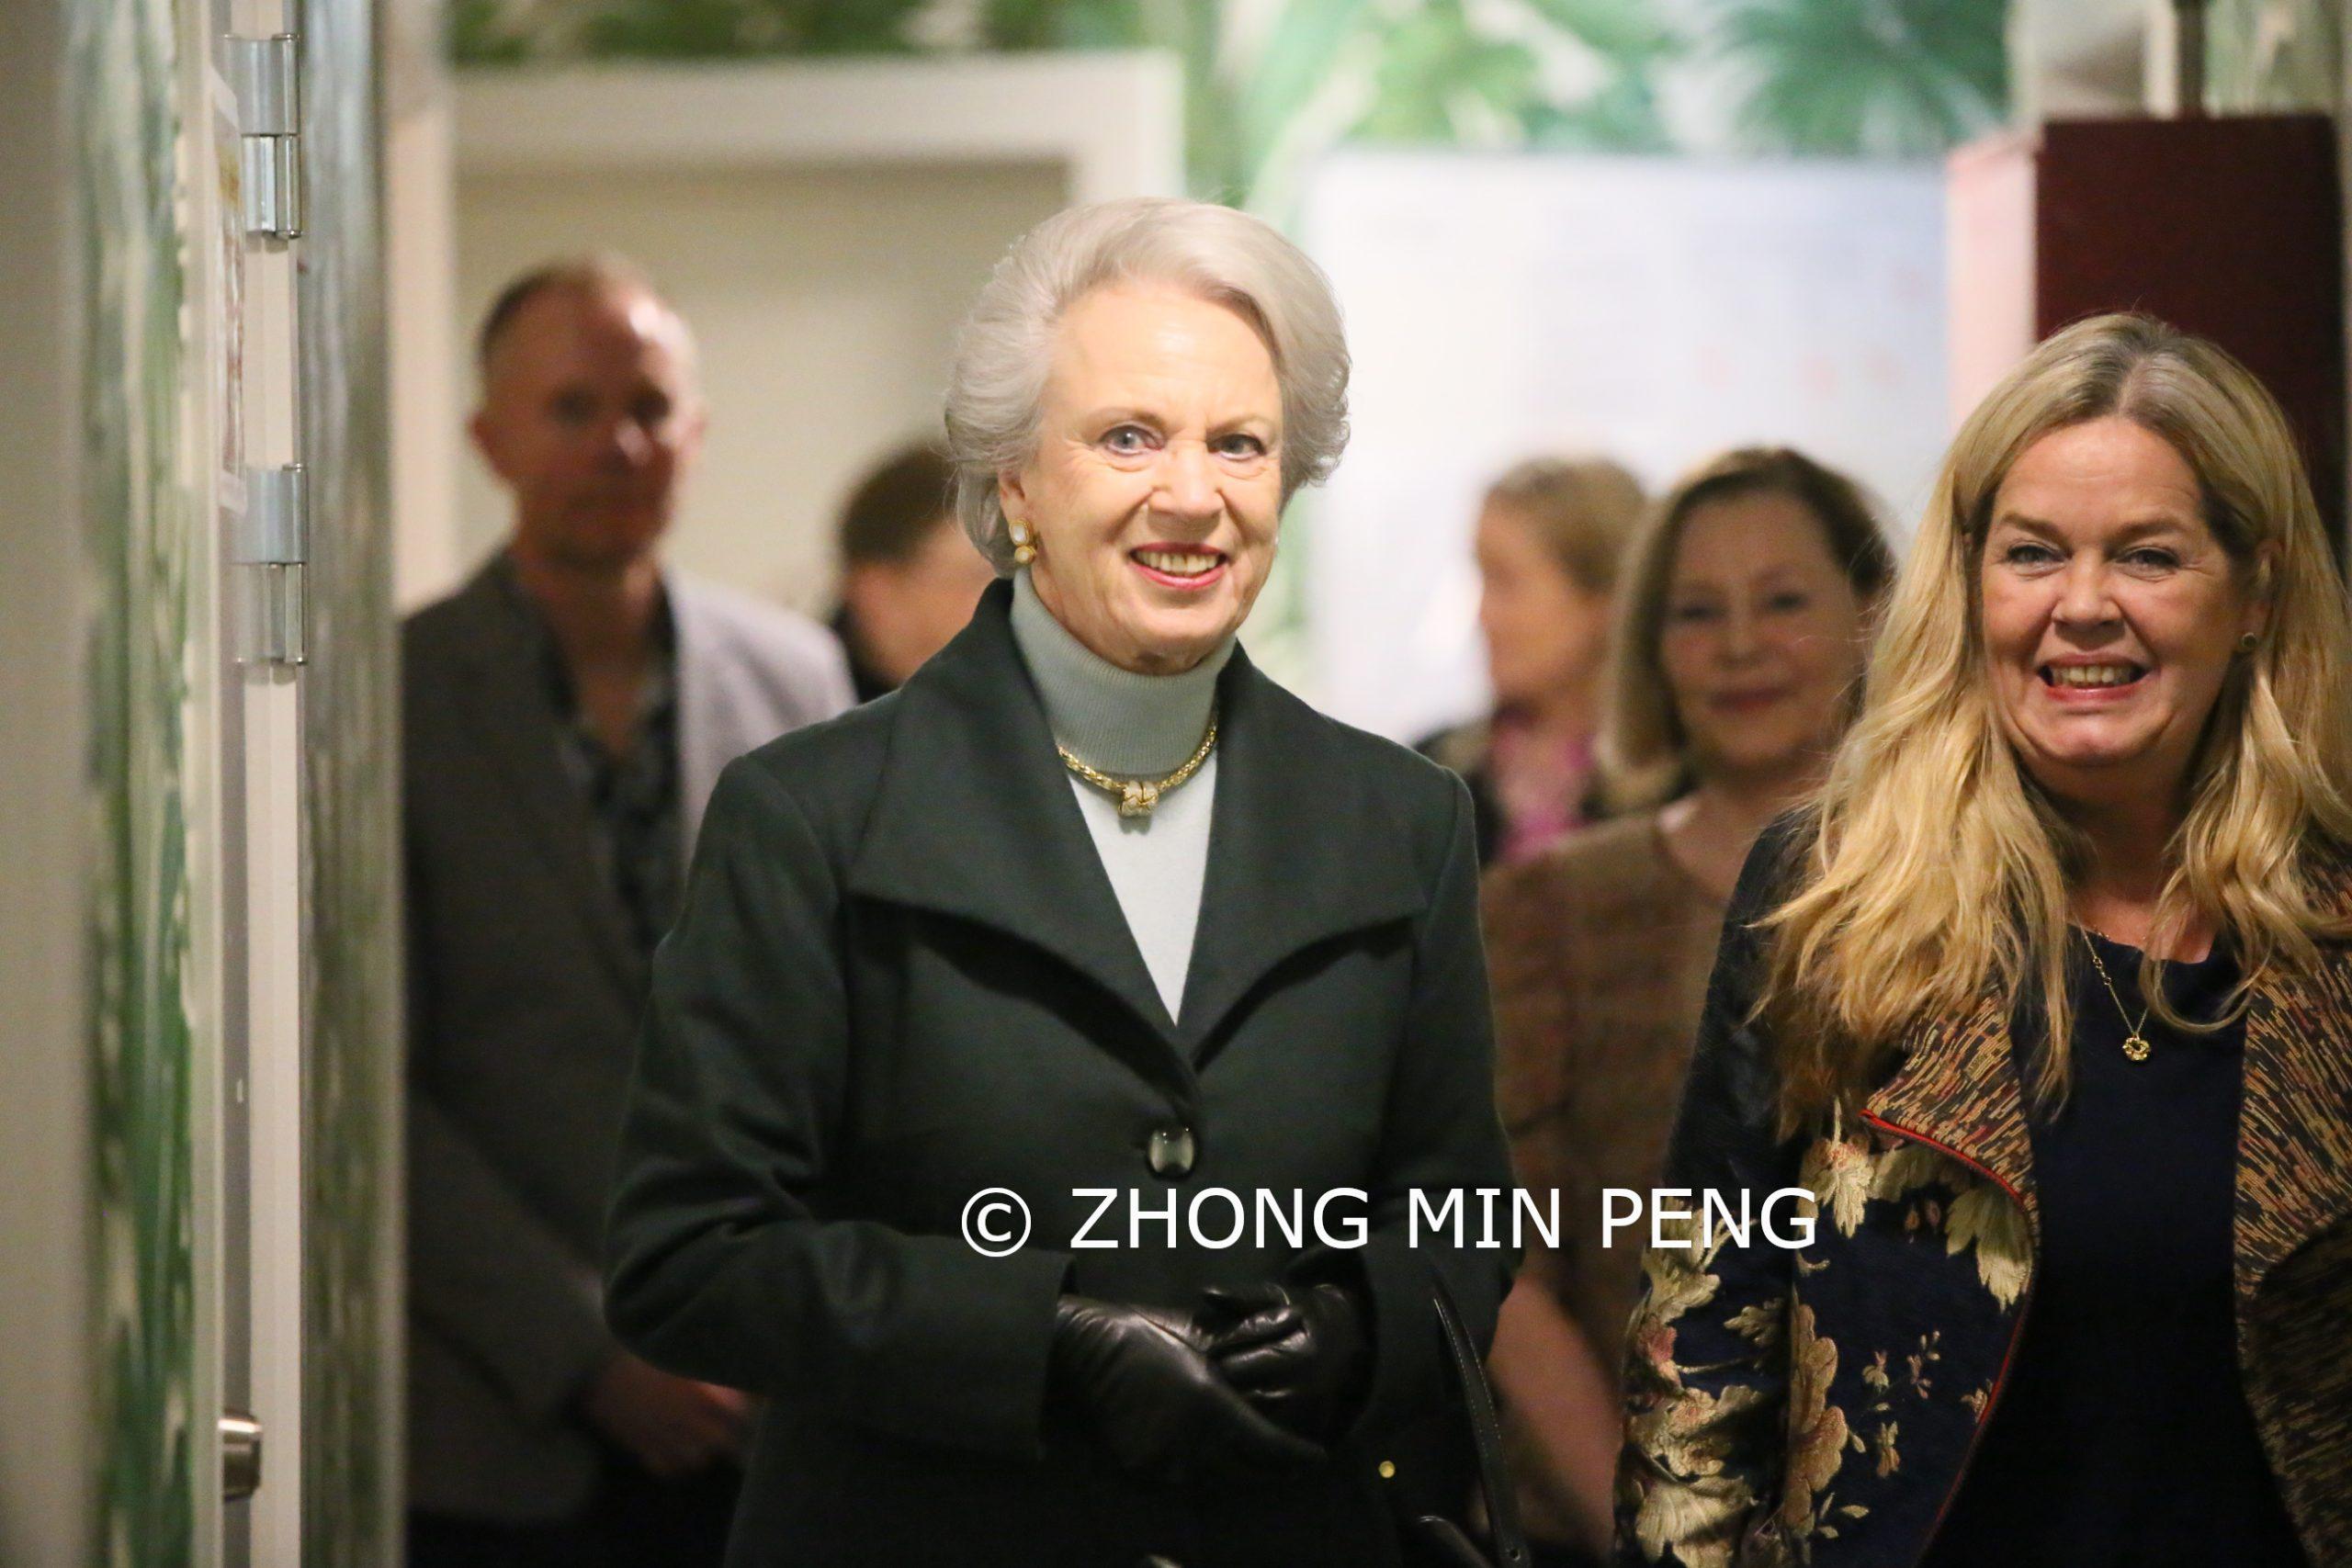 Et besøg med Prinsesse Benedikte hos Hellebro